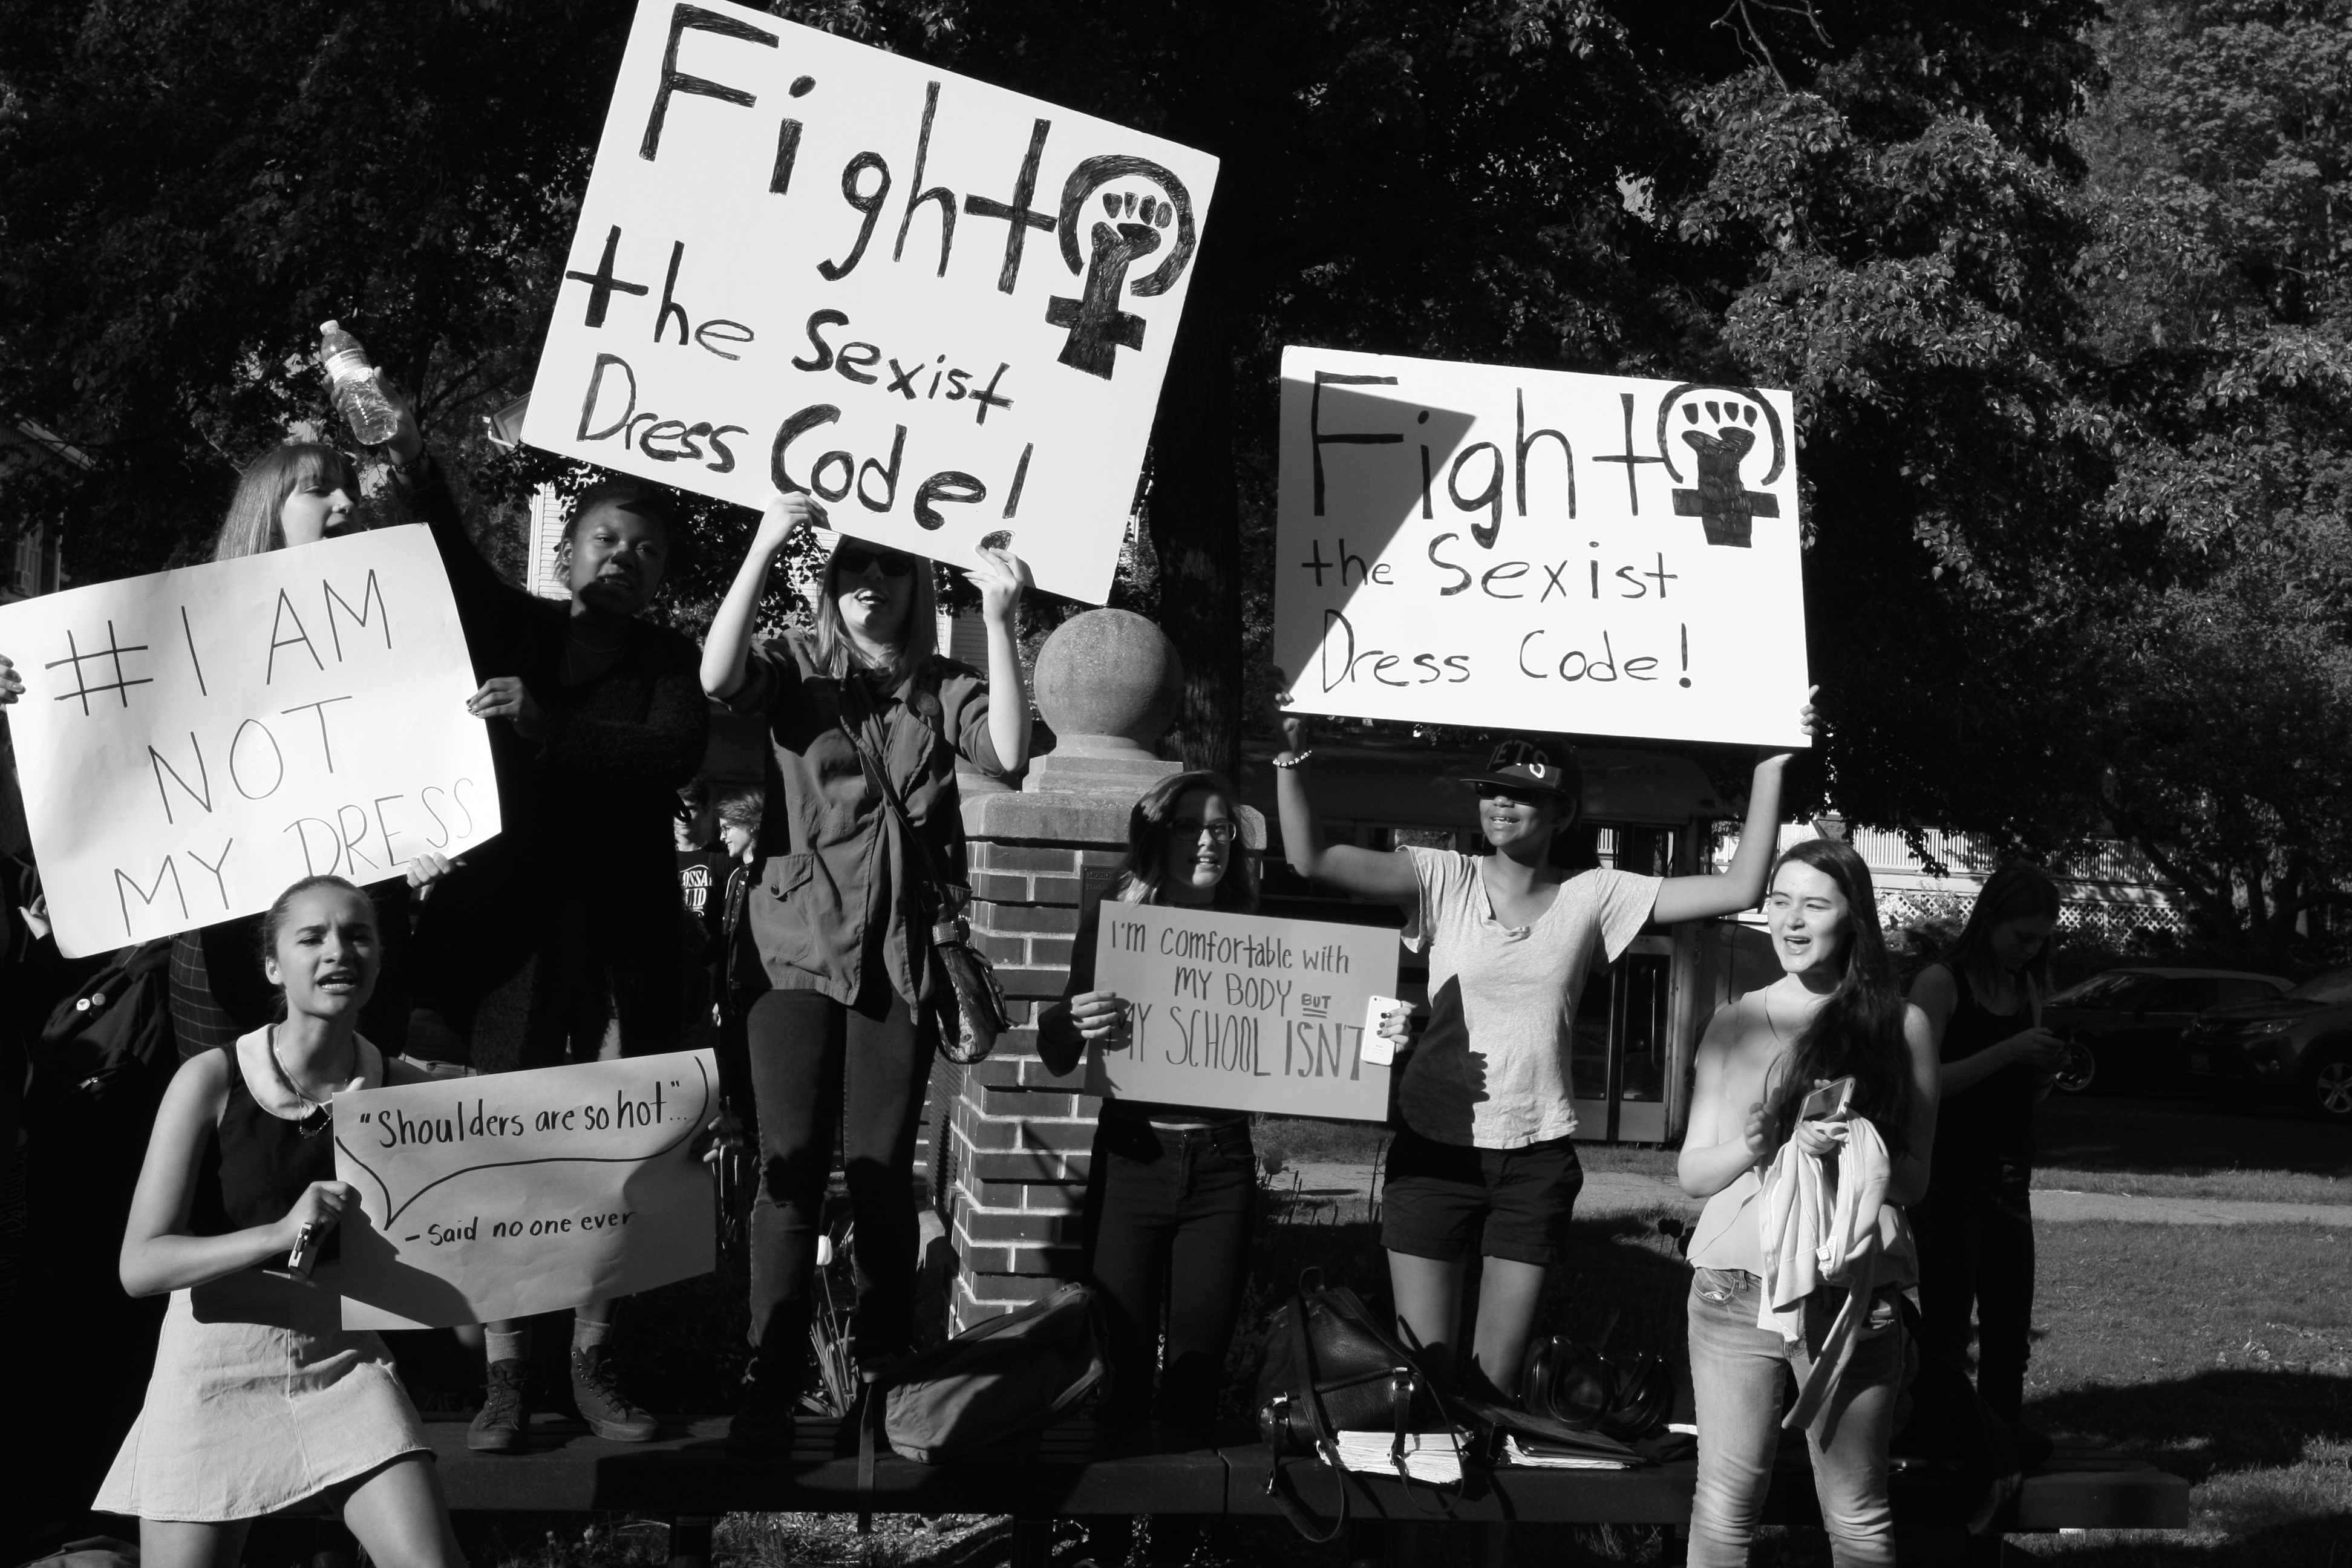 dacf312e2d1ecfbbb5ac_protest.JPG